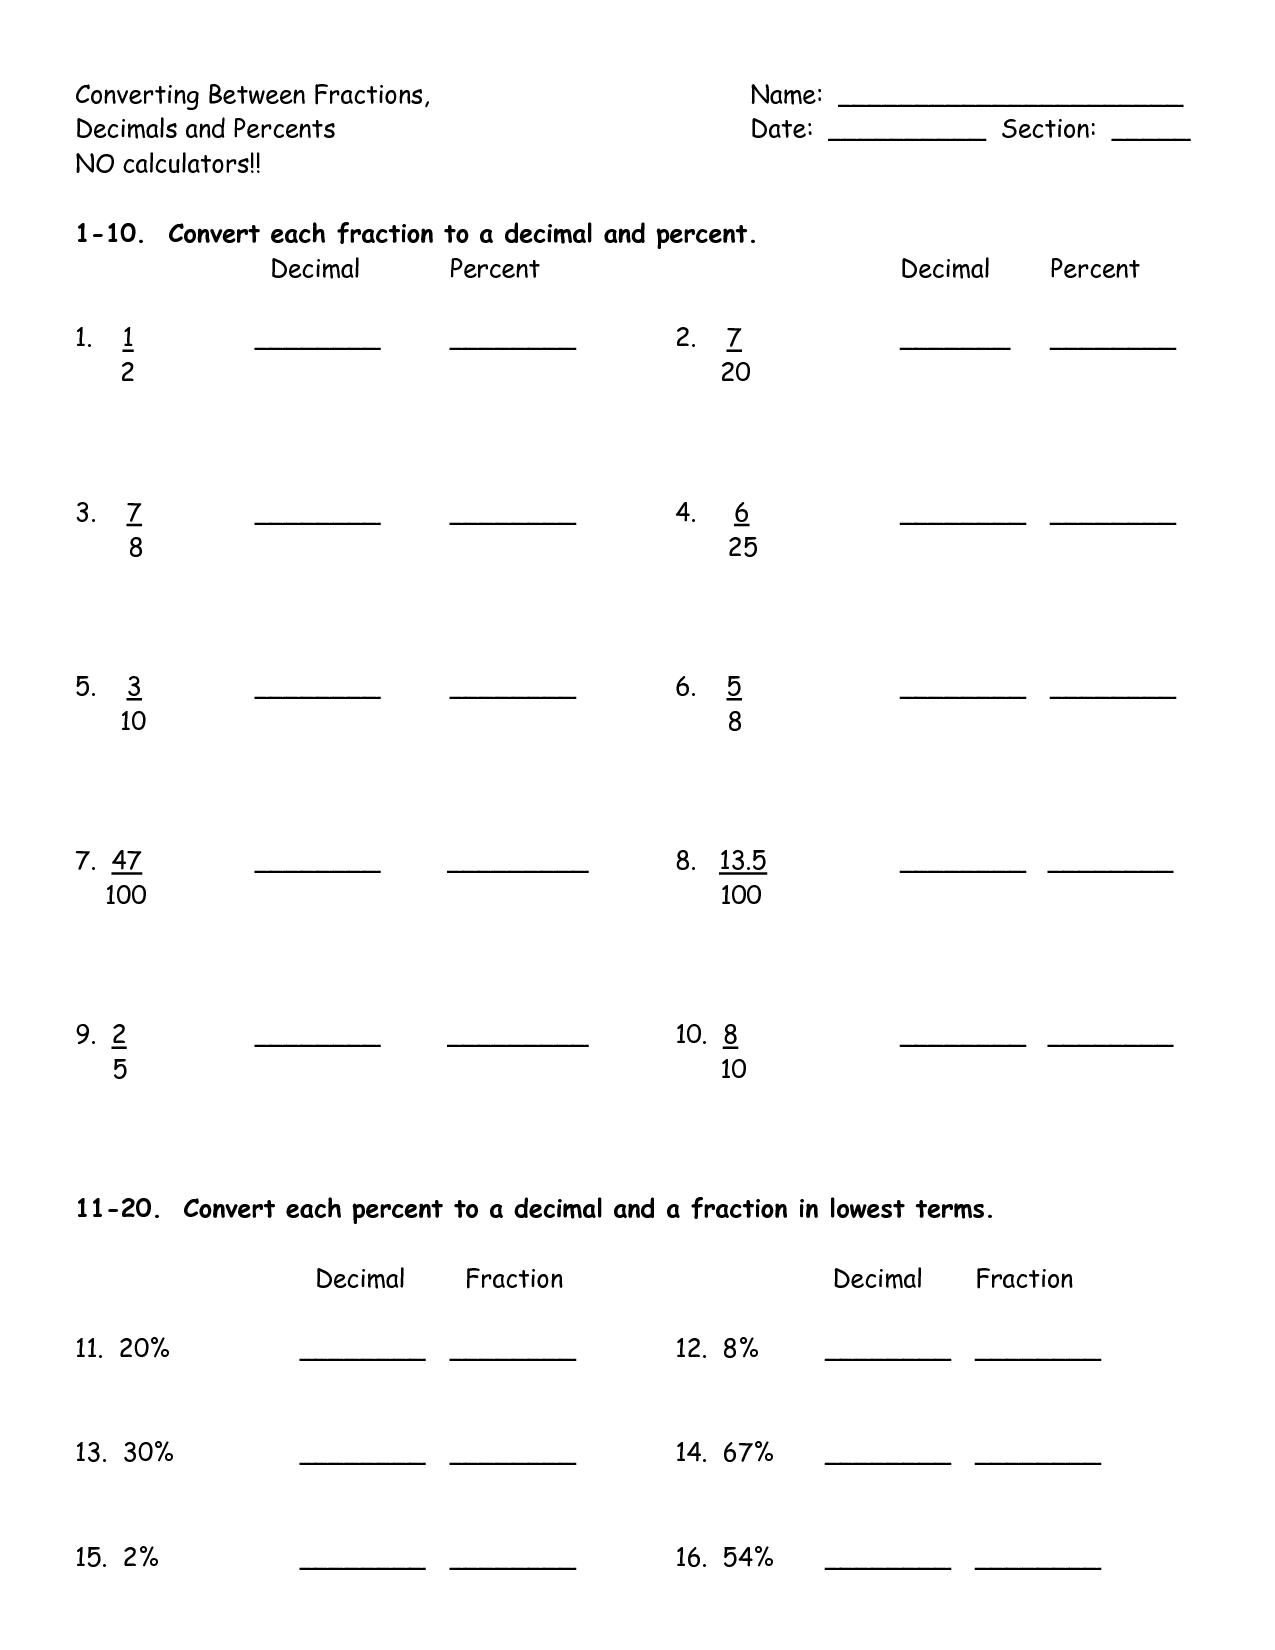 Converting Benchmark Fractions To Decimals Worksheet